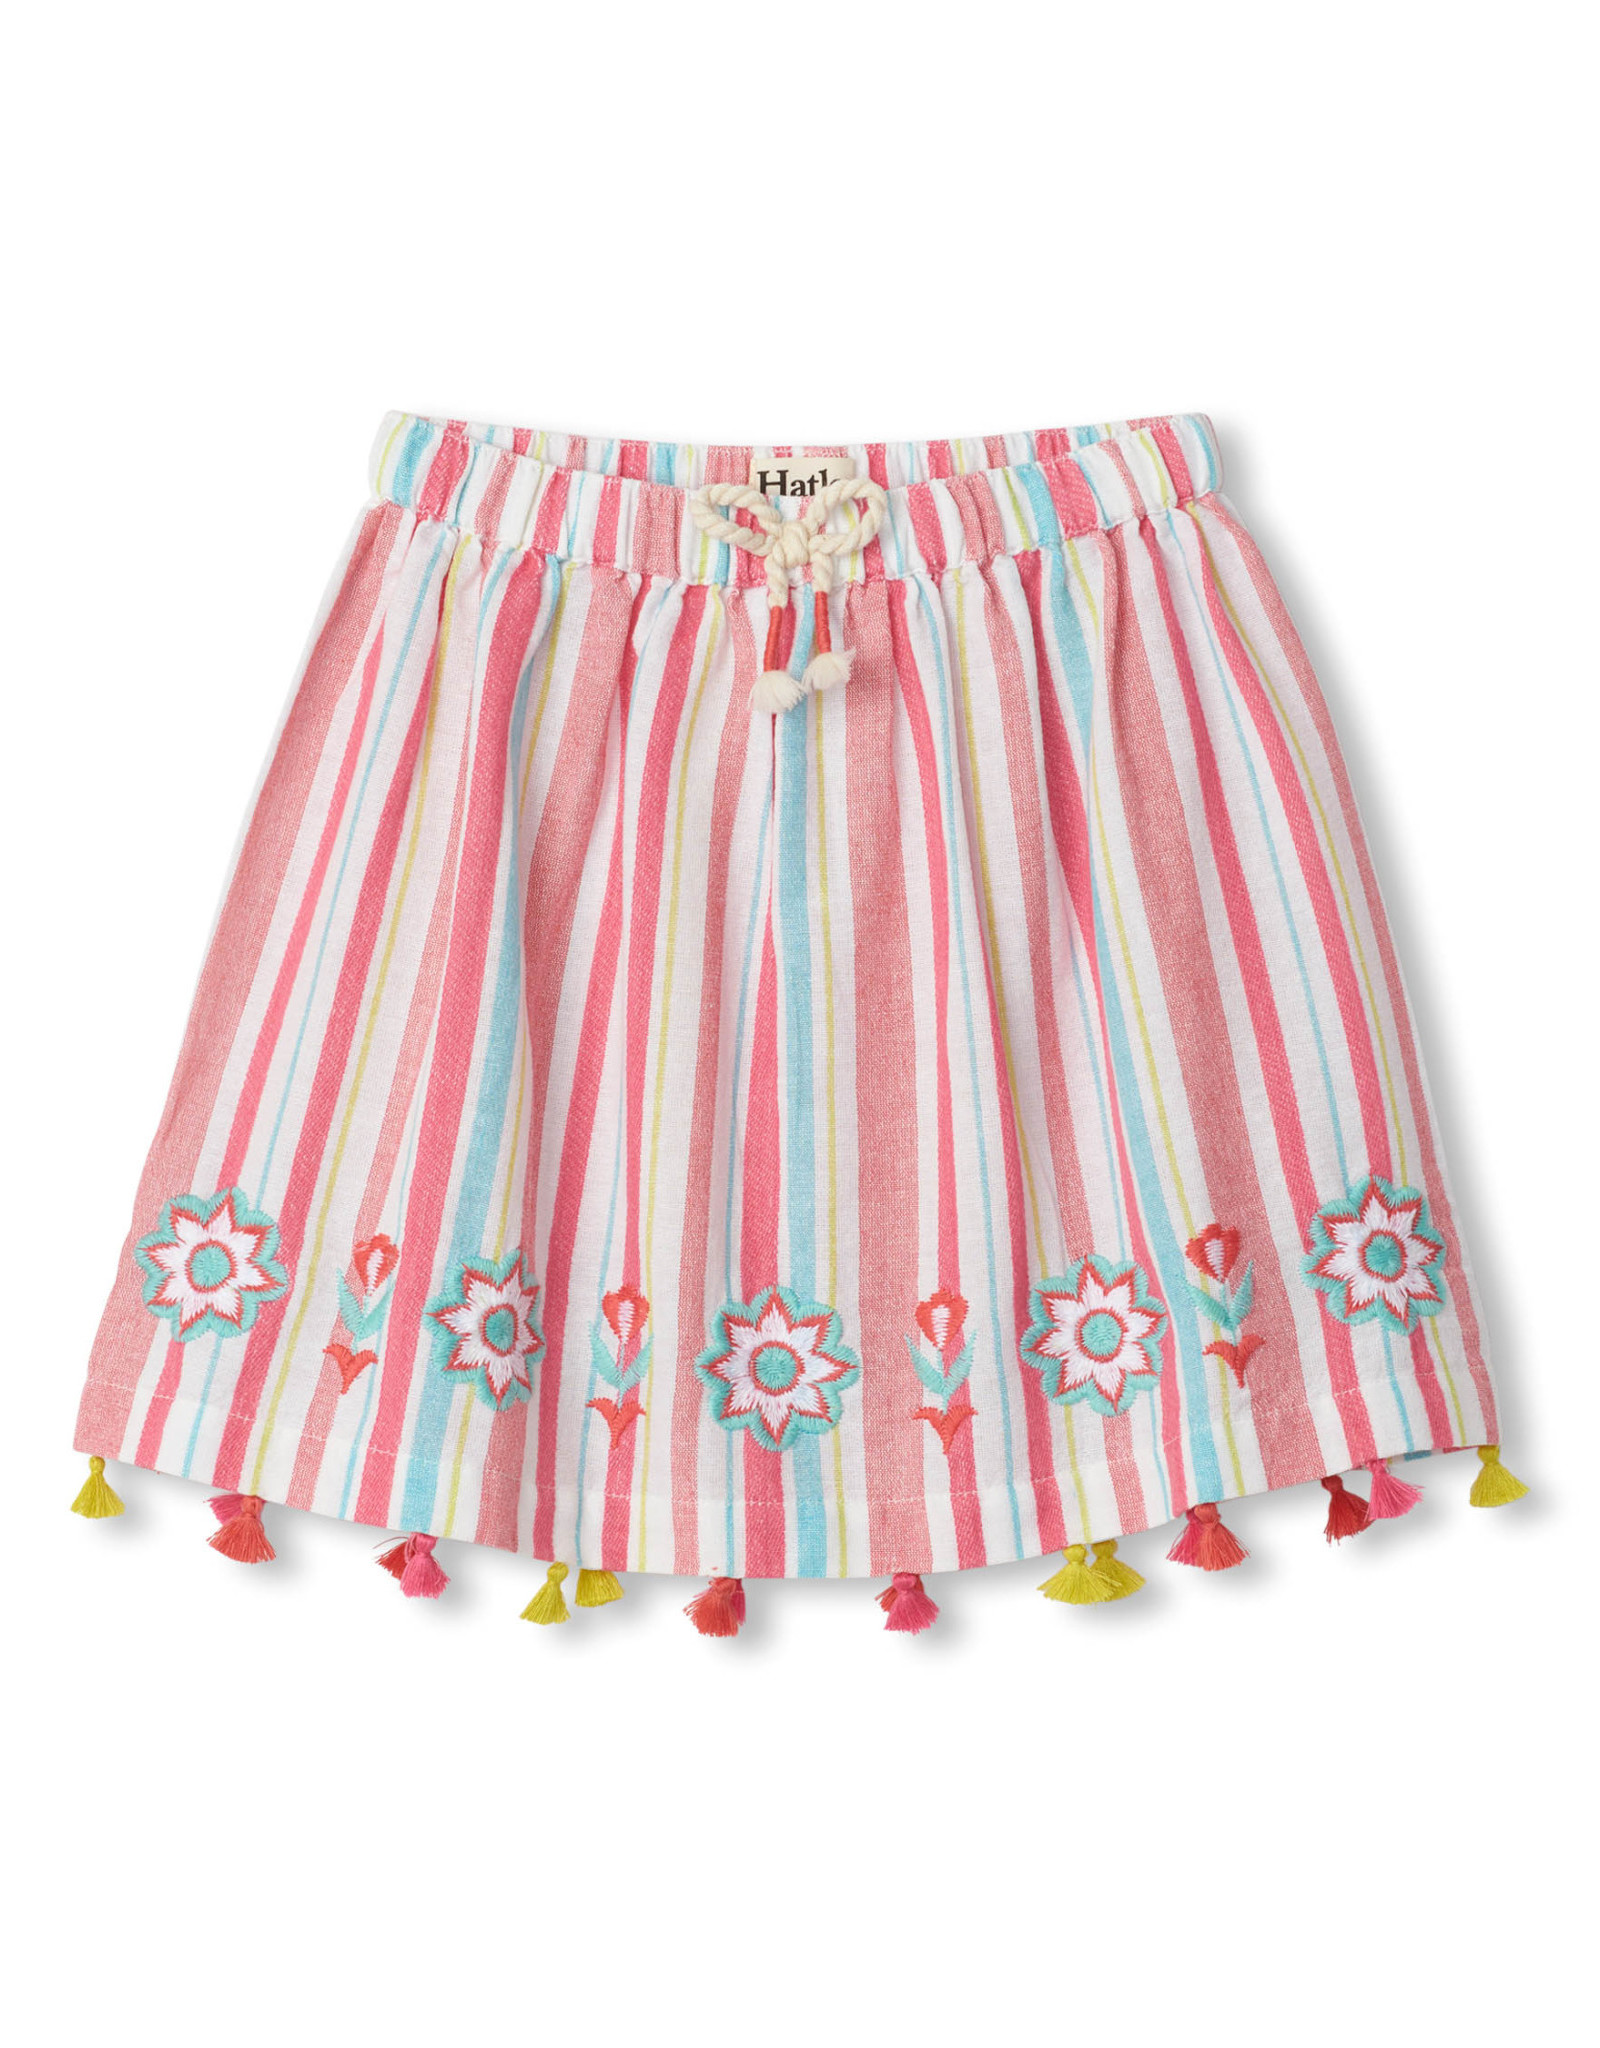 Hatley Pink Lemonade Tassel Skirt